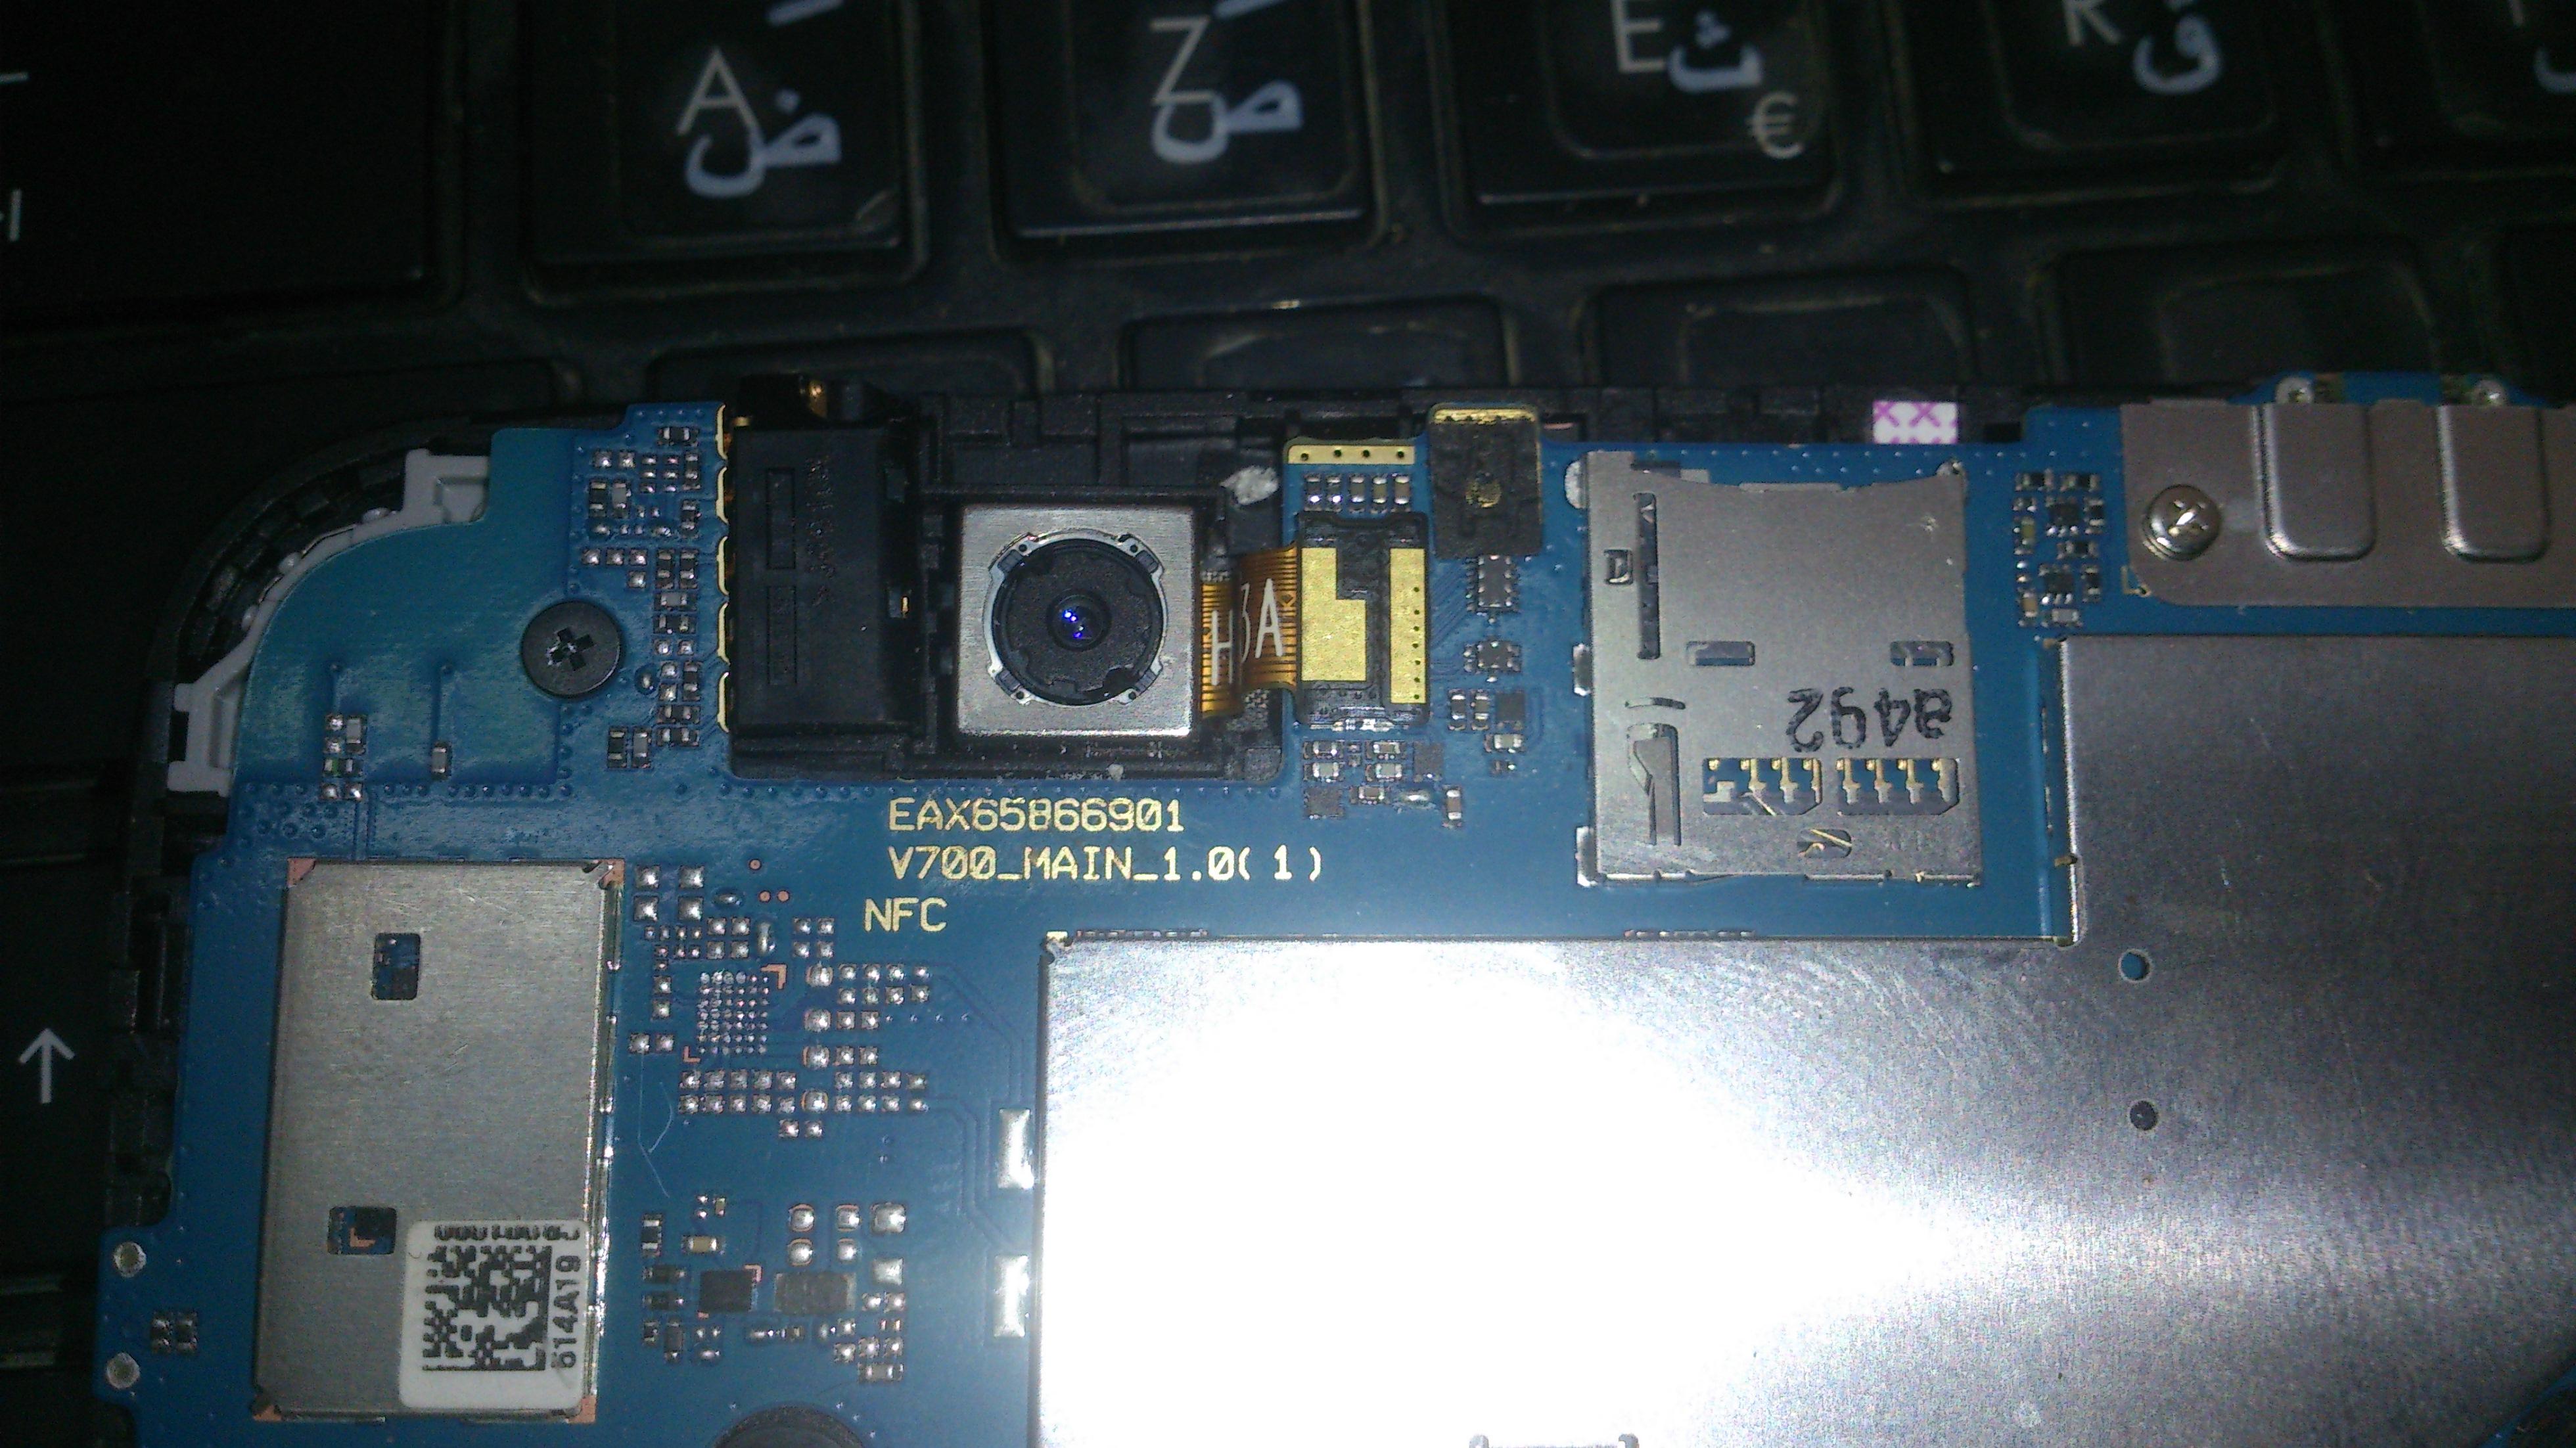 ���� �� (�����) Firmware ����� LG ������ �� ���� ����